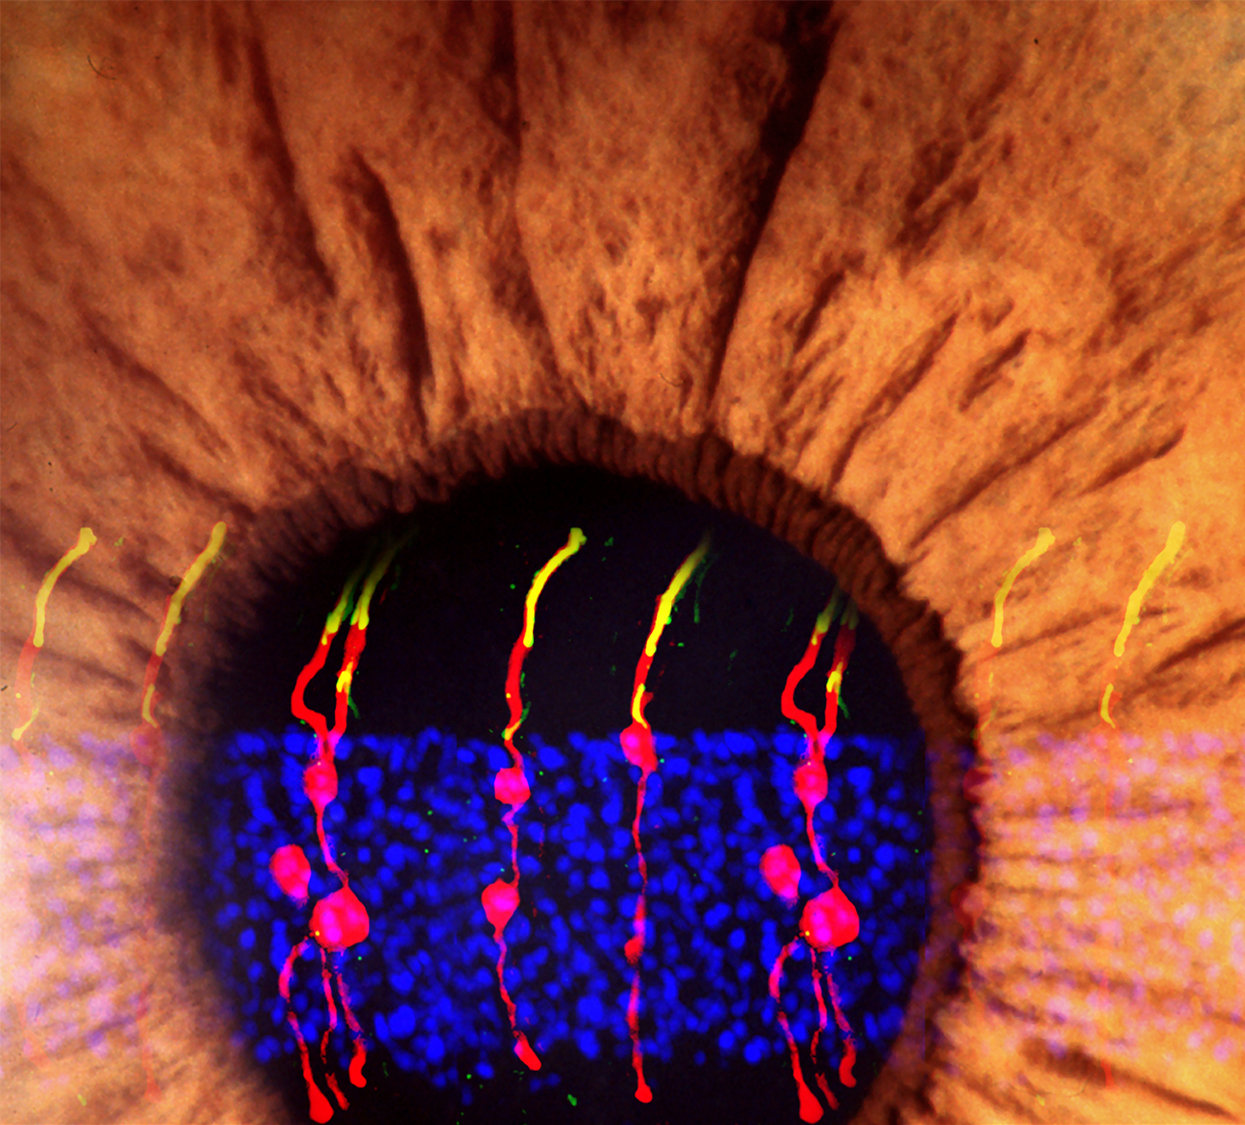 Researchers Reverse Congenital Blindness In Mice